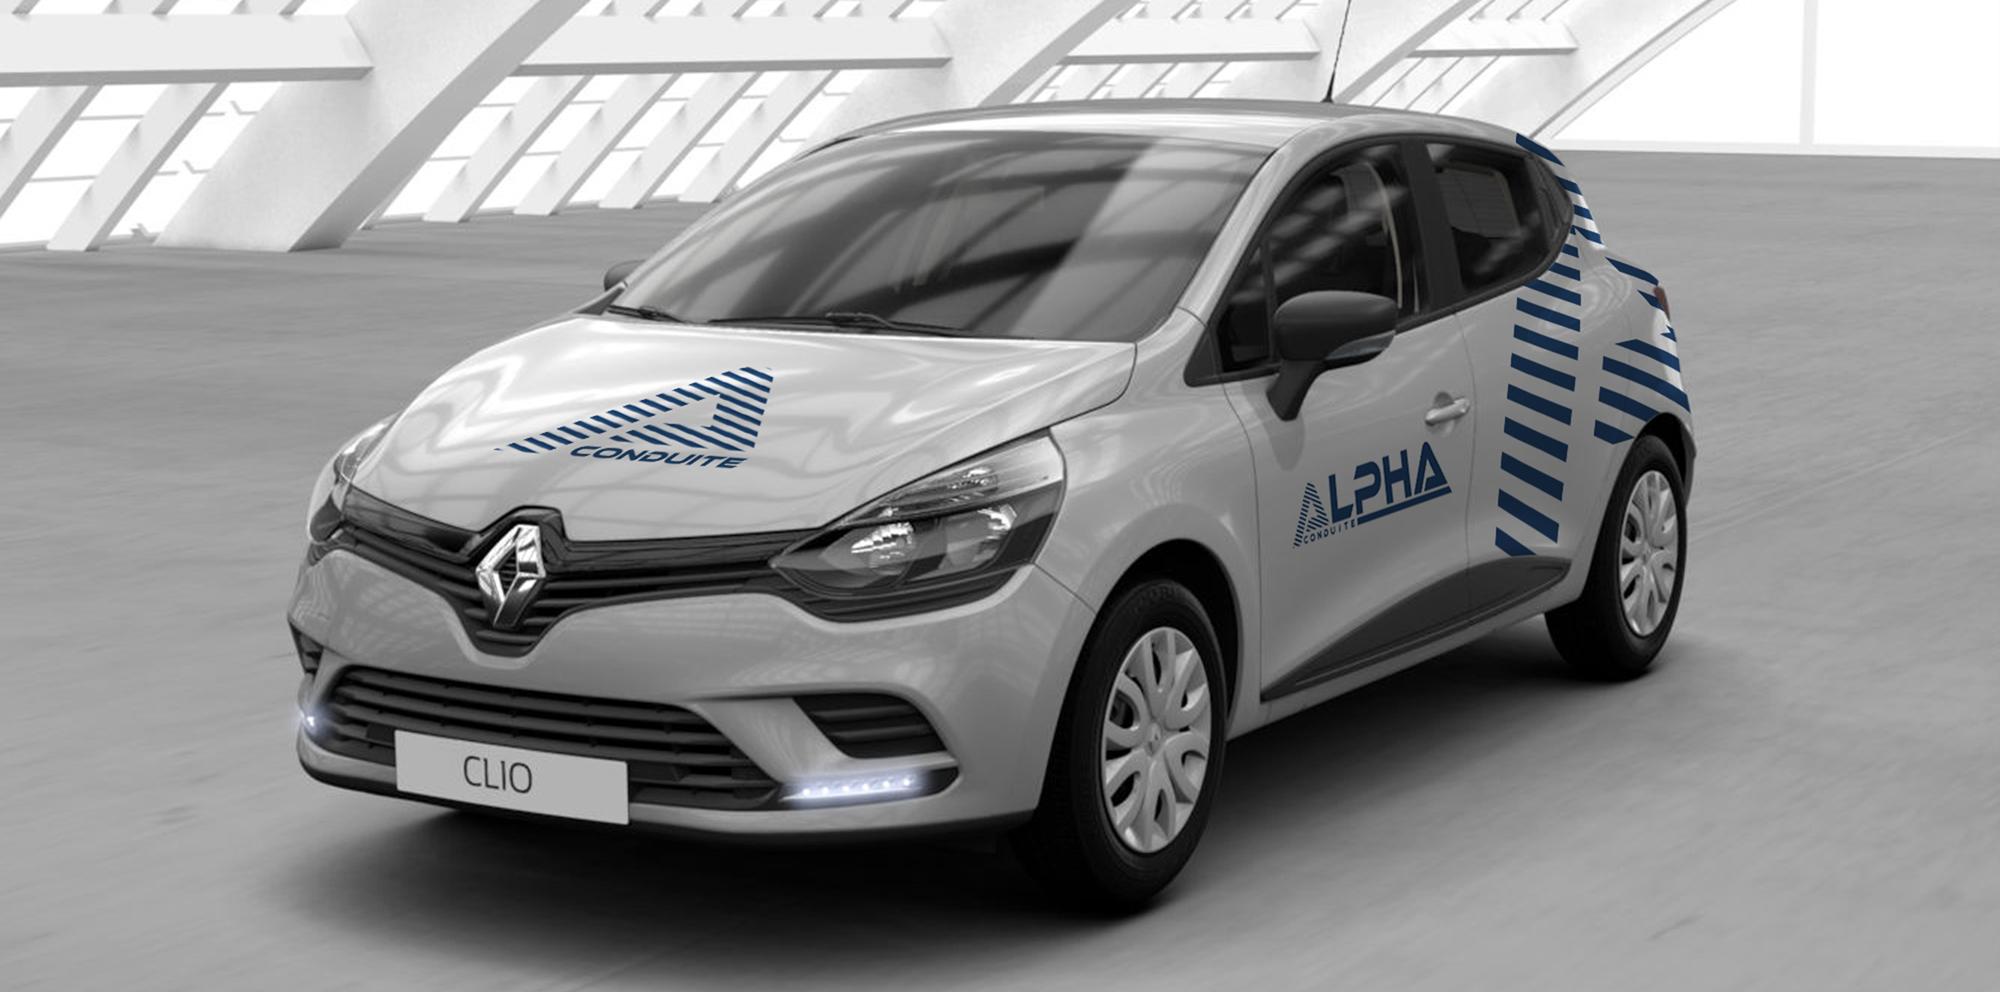 Vehicule-Alpha-conduite-Mockup